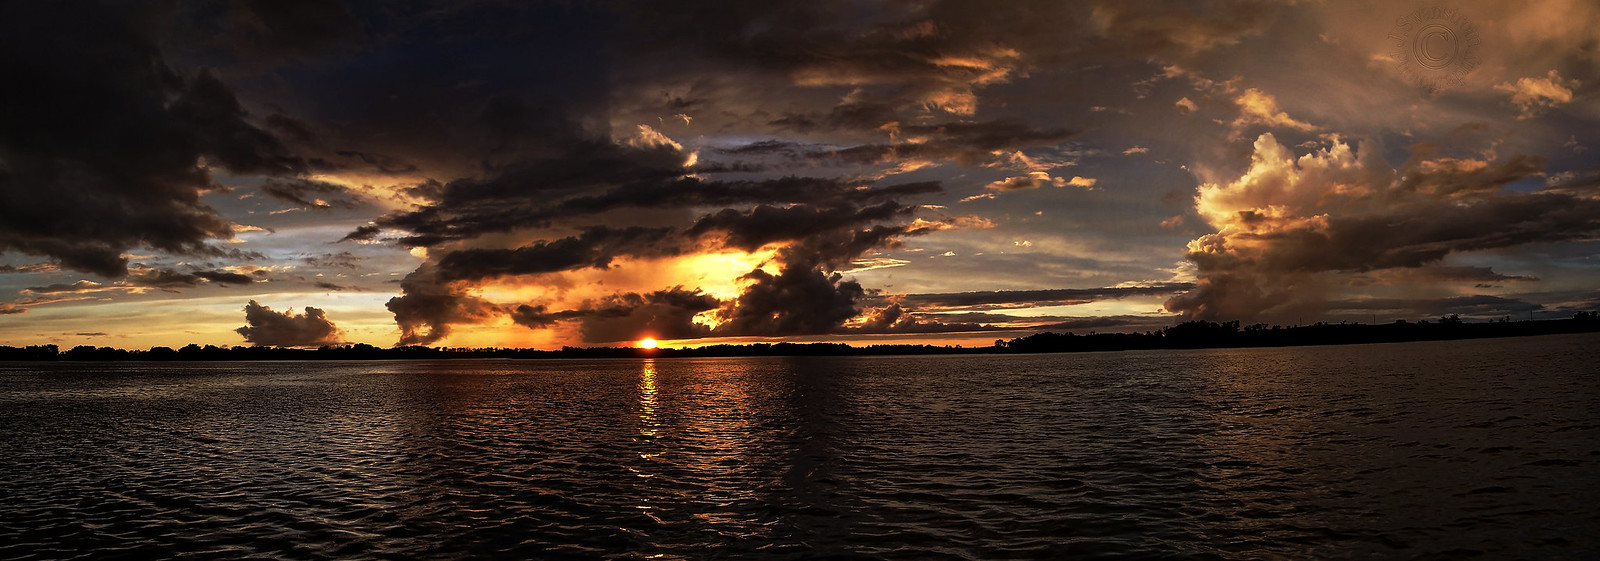 Fantastic Skies Over Pickerel Lake (4 Shot Pano)